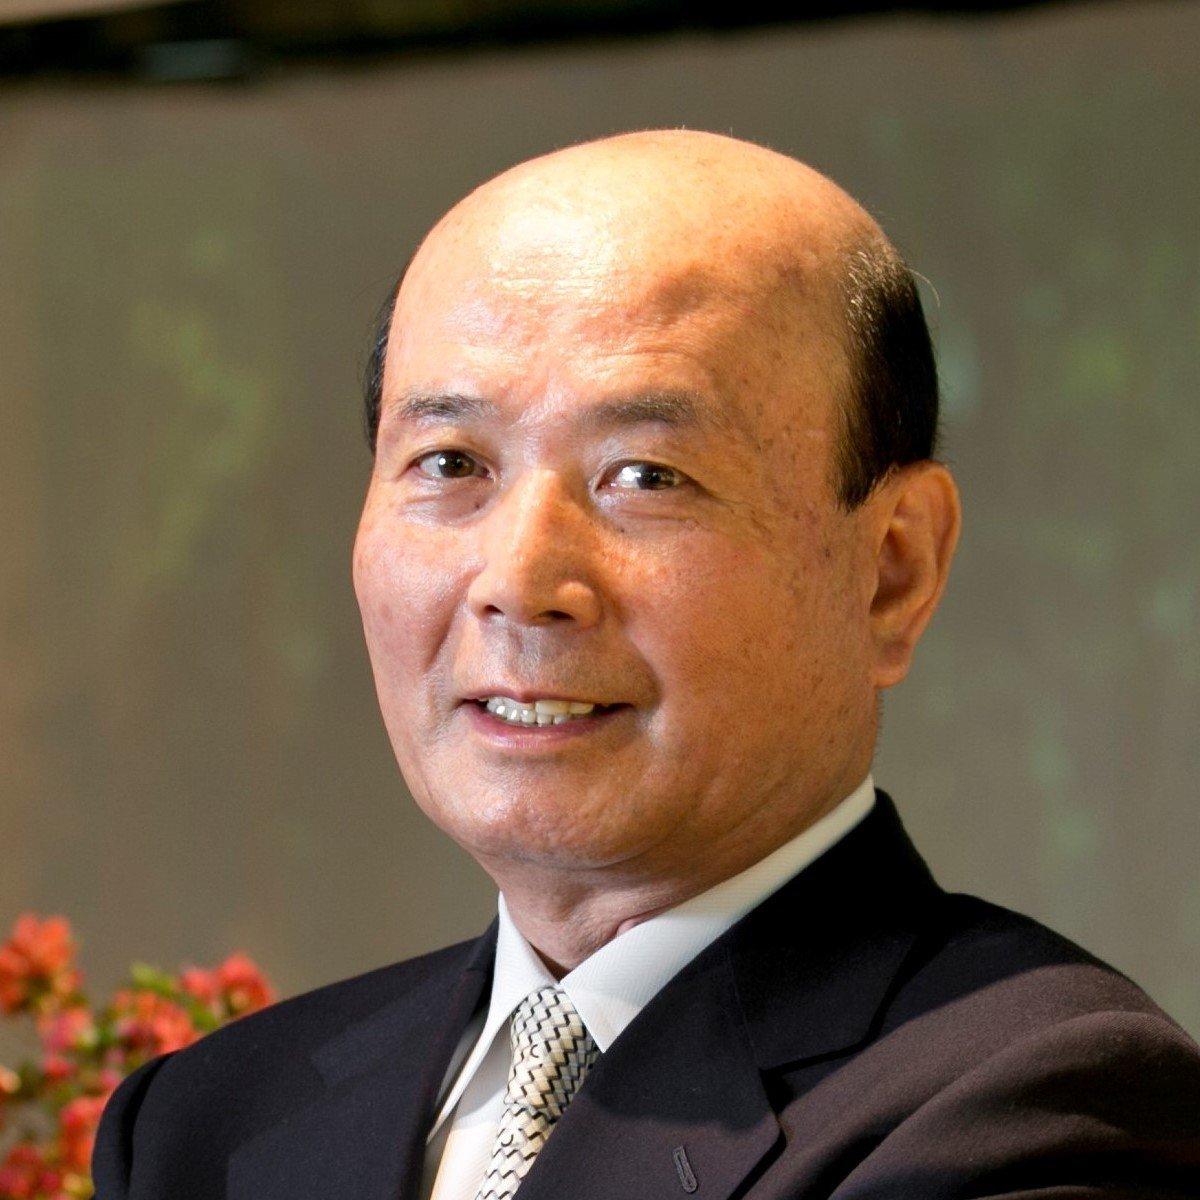 Hideki Kurashige